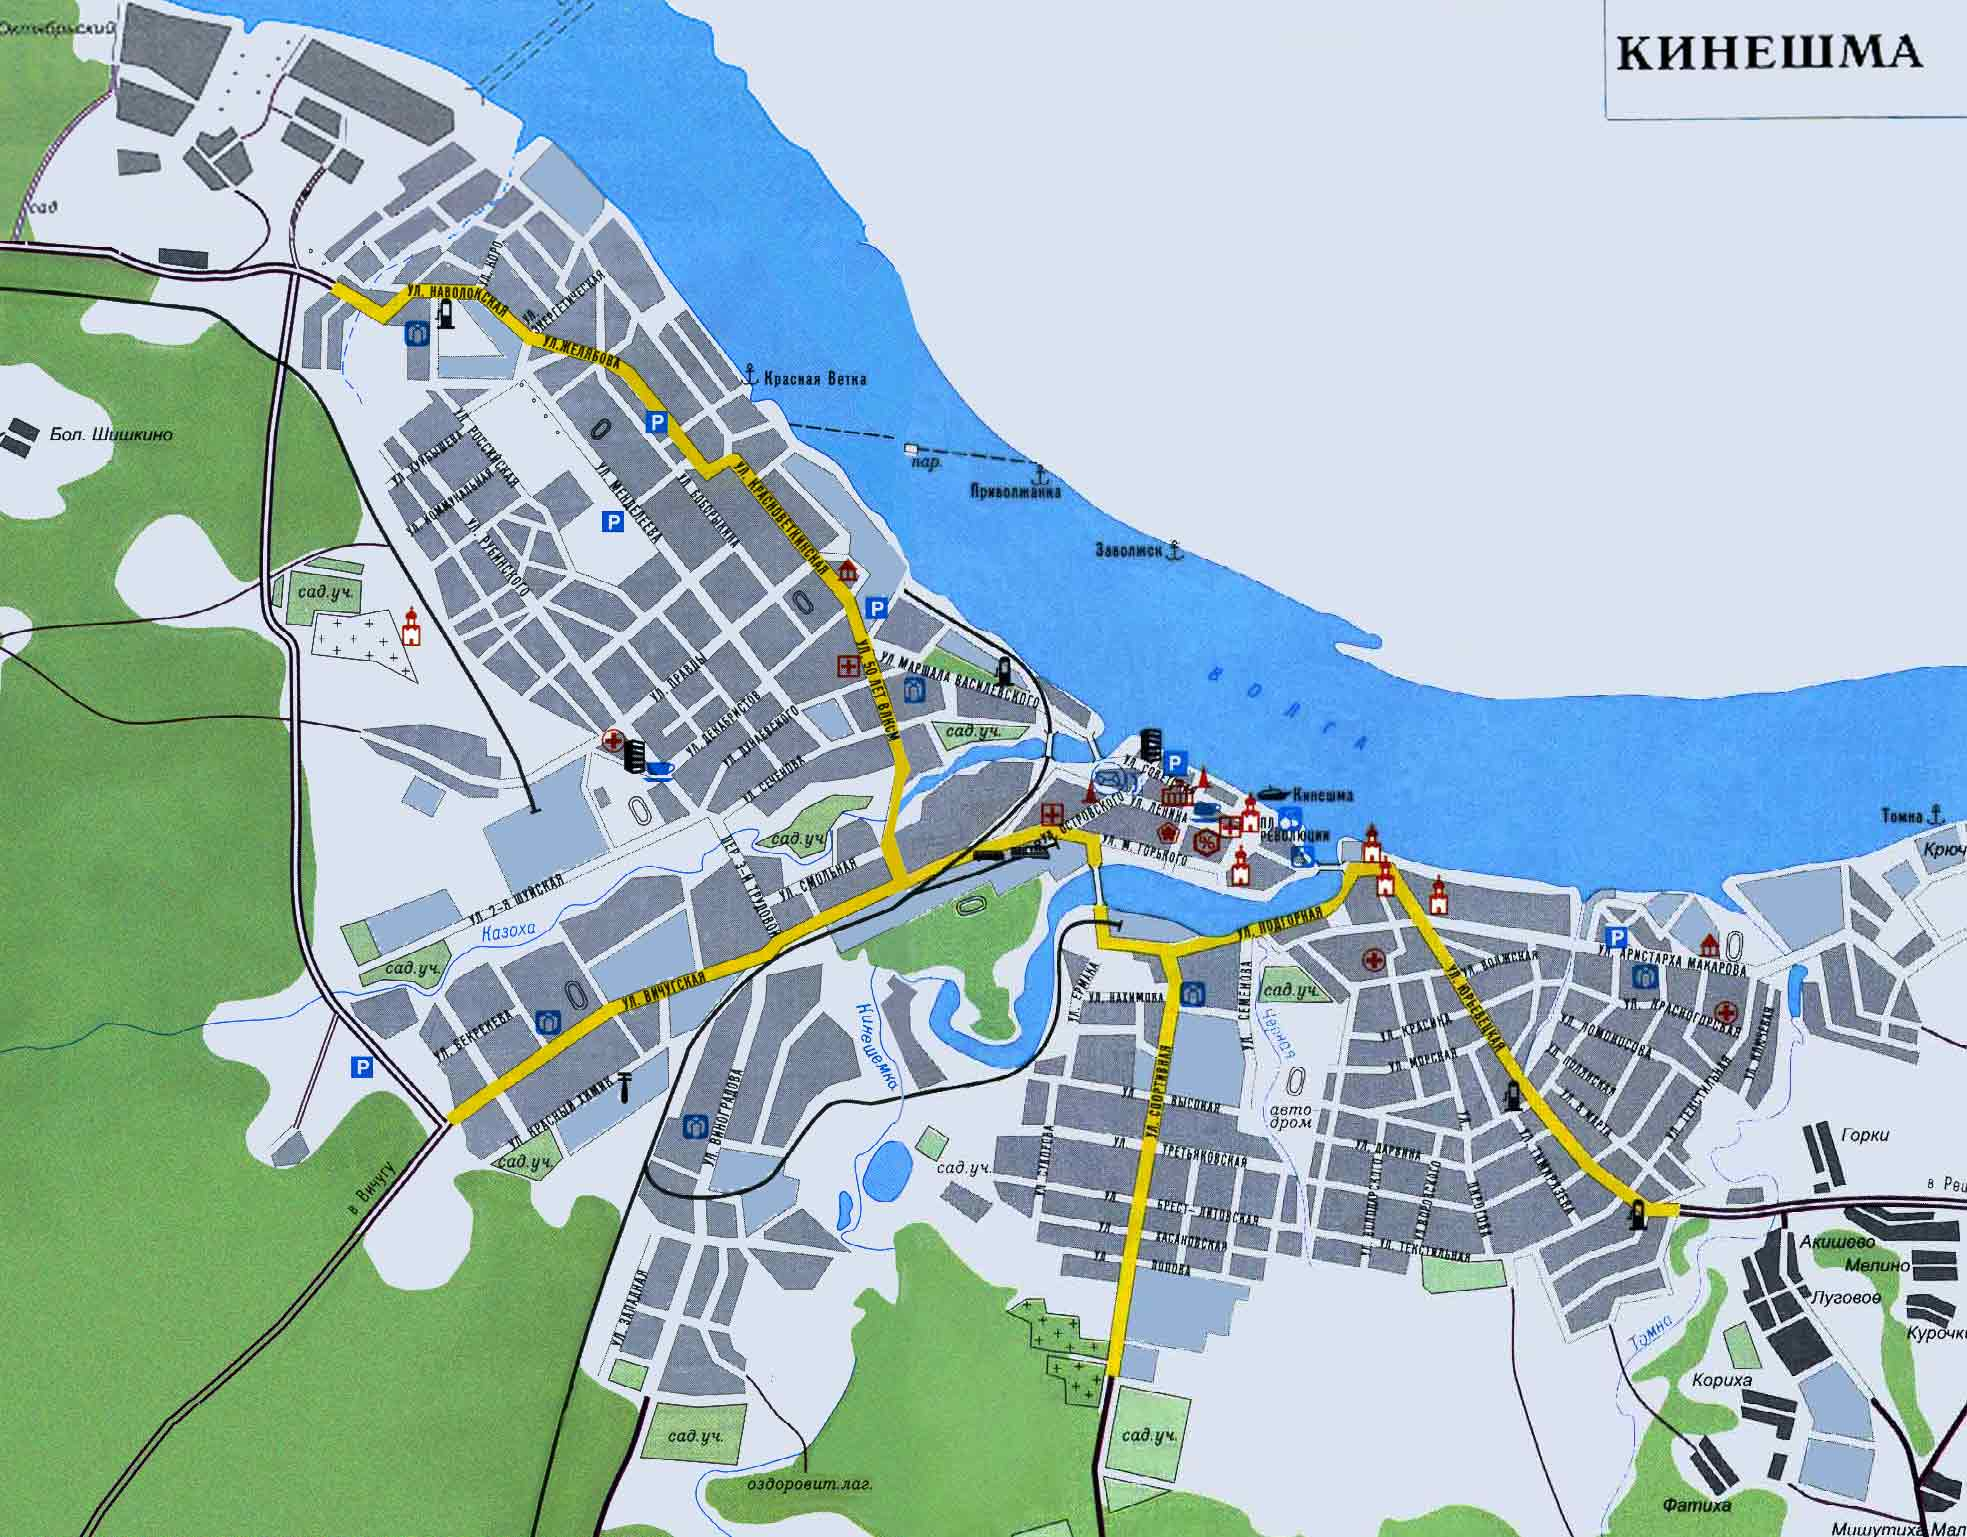 Карта города кинешма с улицами